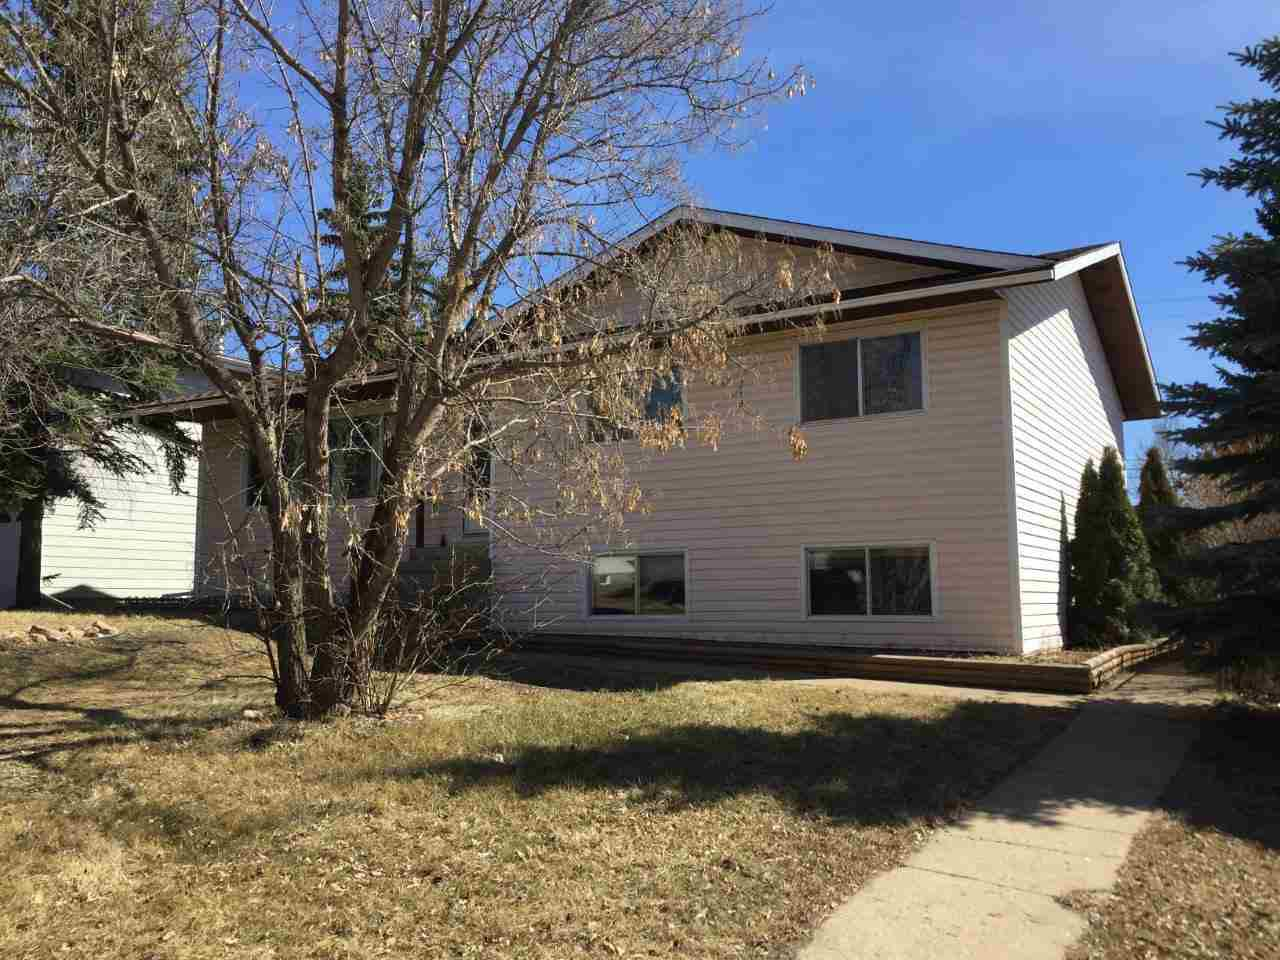 Main Photo: 4807 47 Street: Hardisty House for sale : MLS®# E4150963